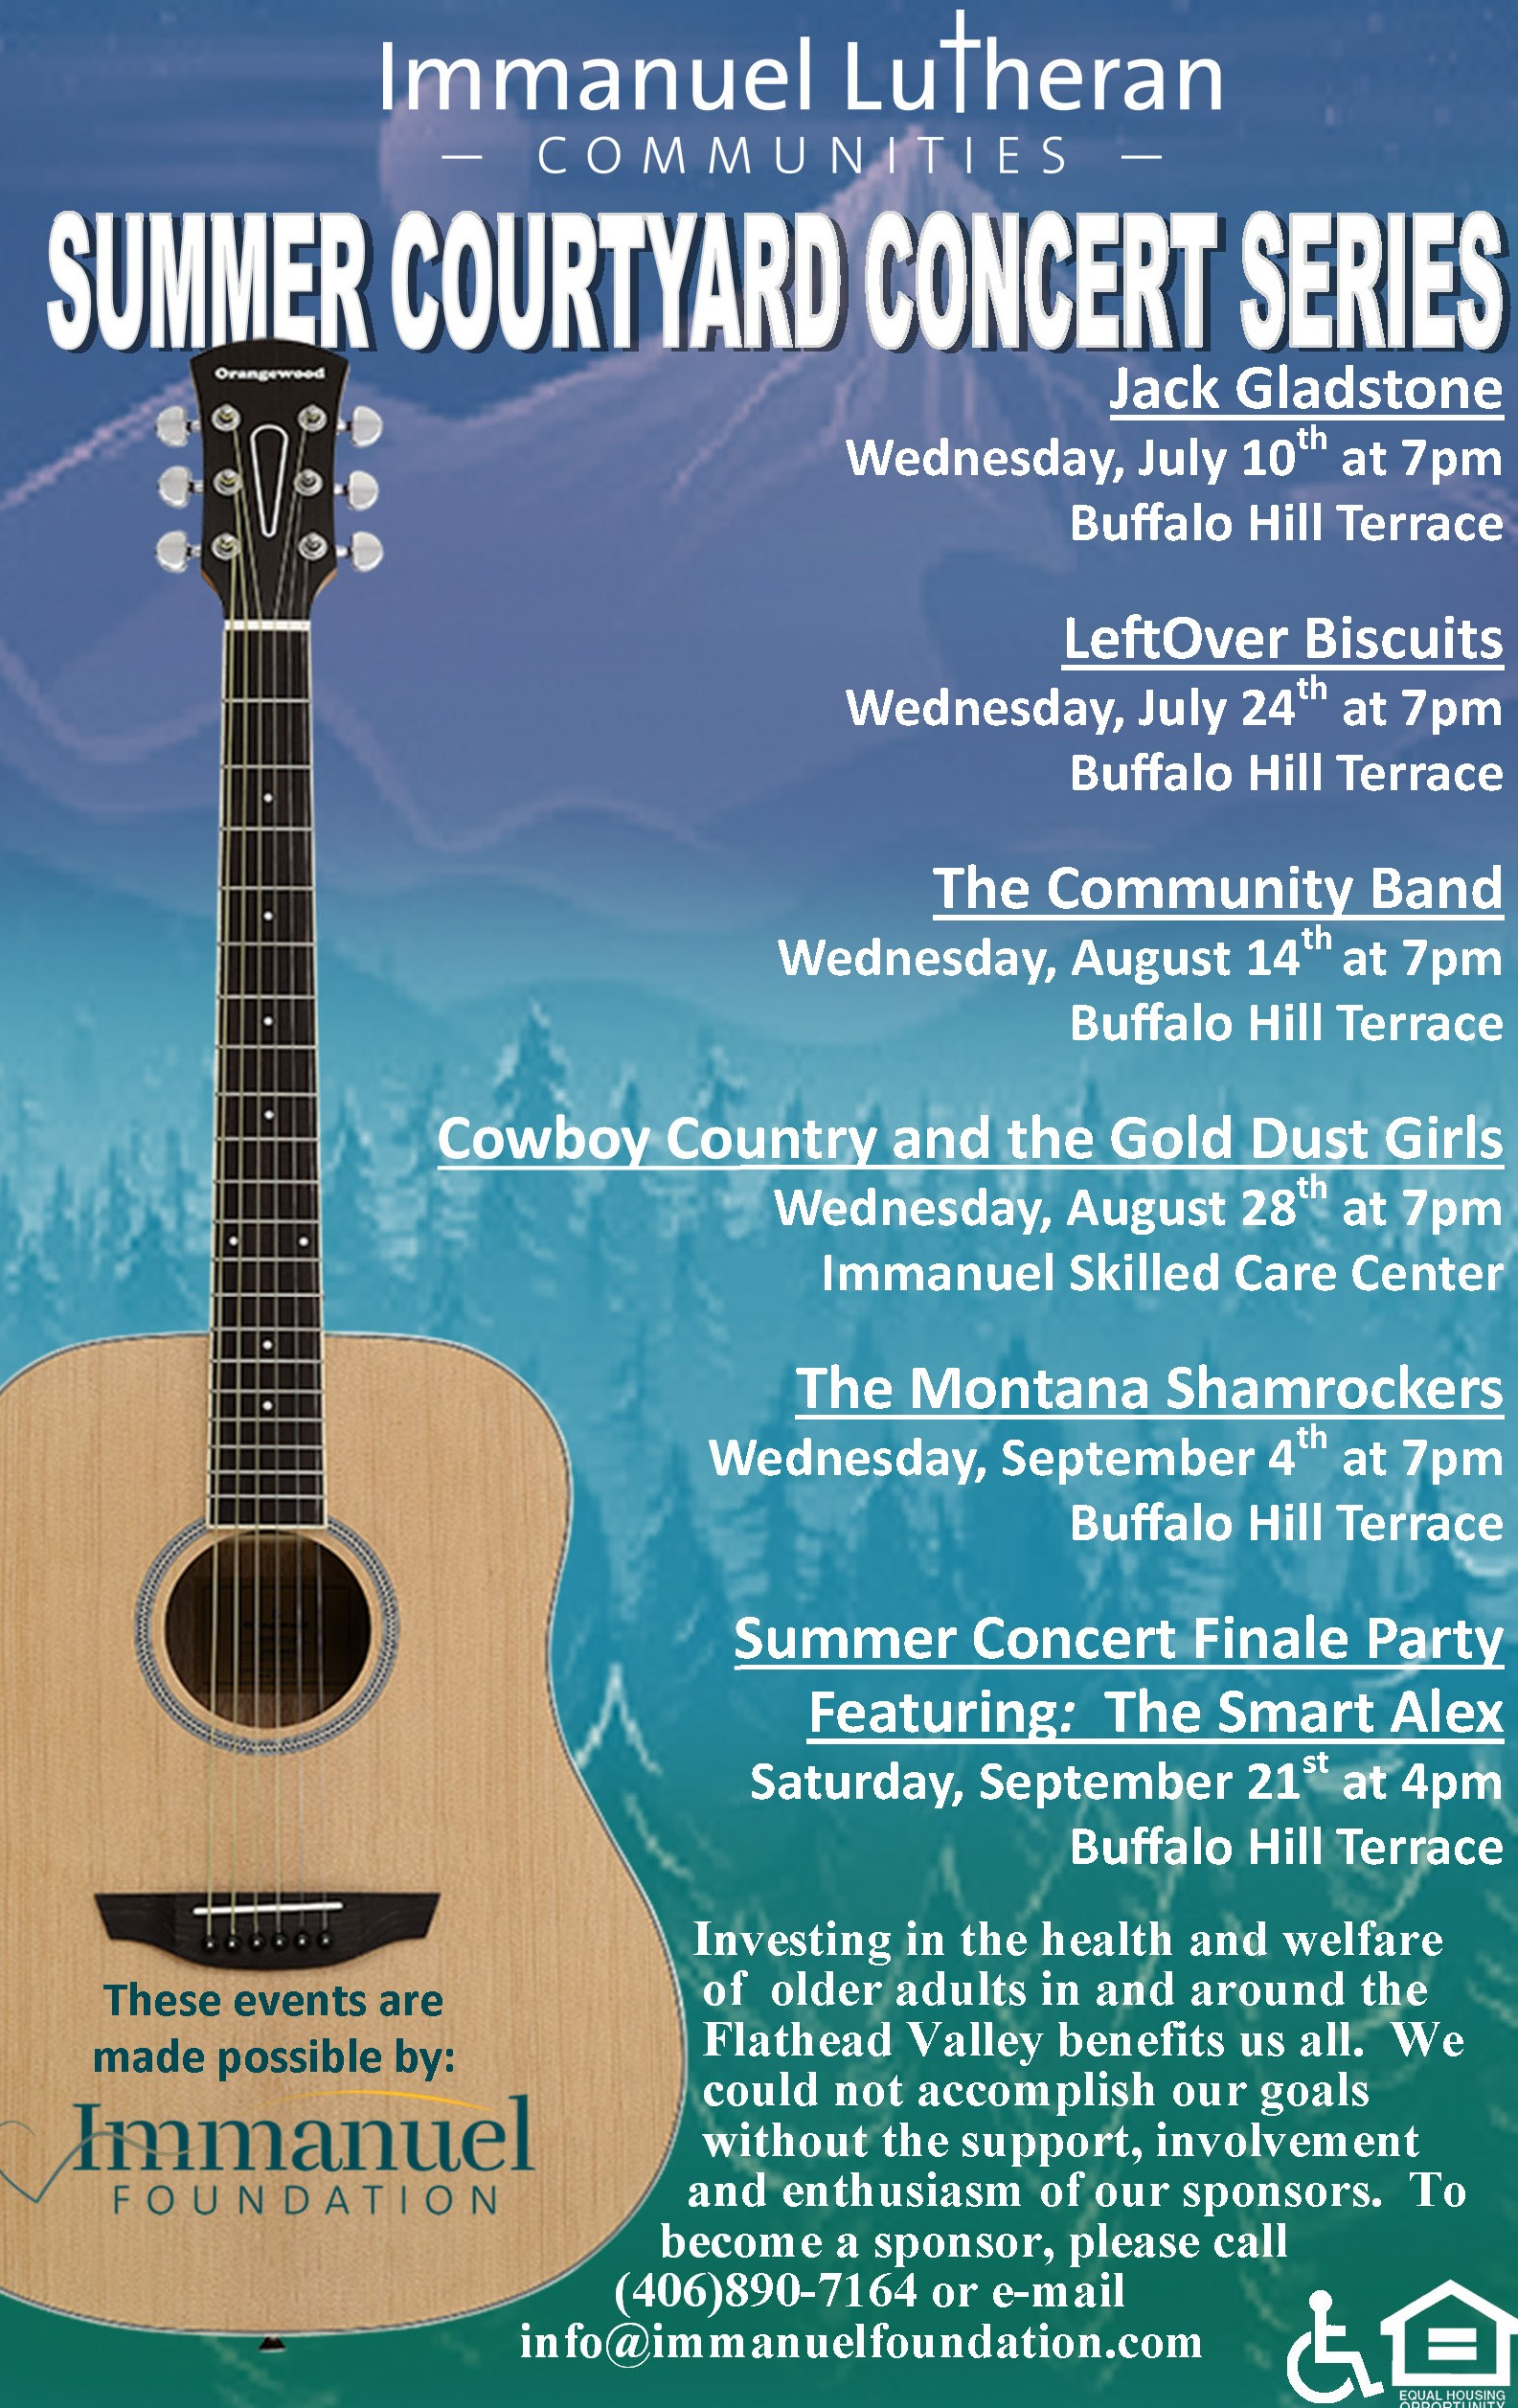 Summer Courtyard Concert Series Kickoff